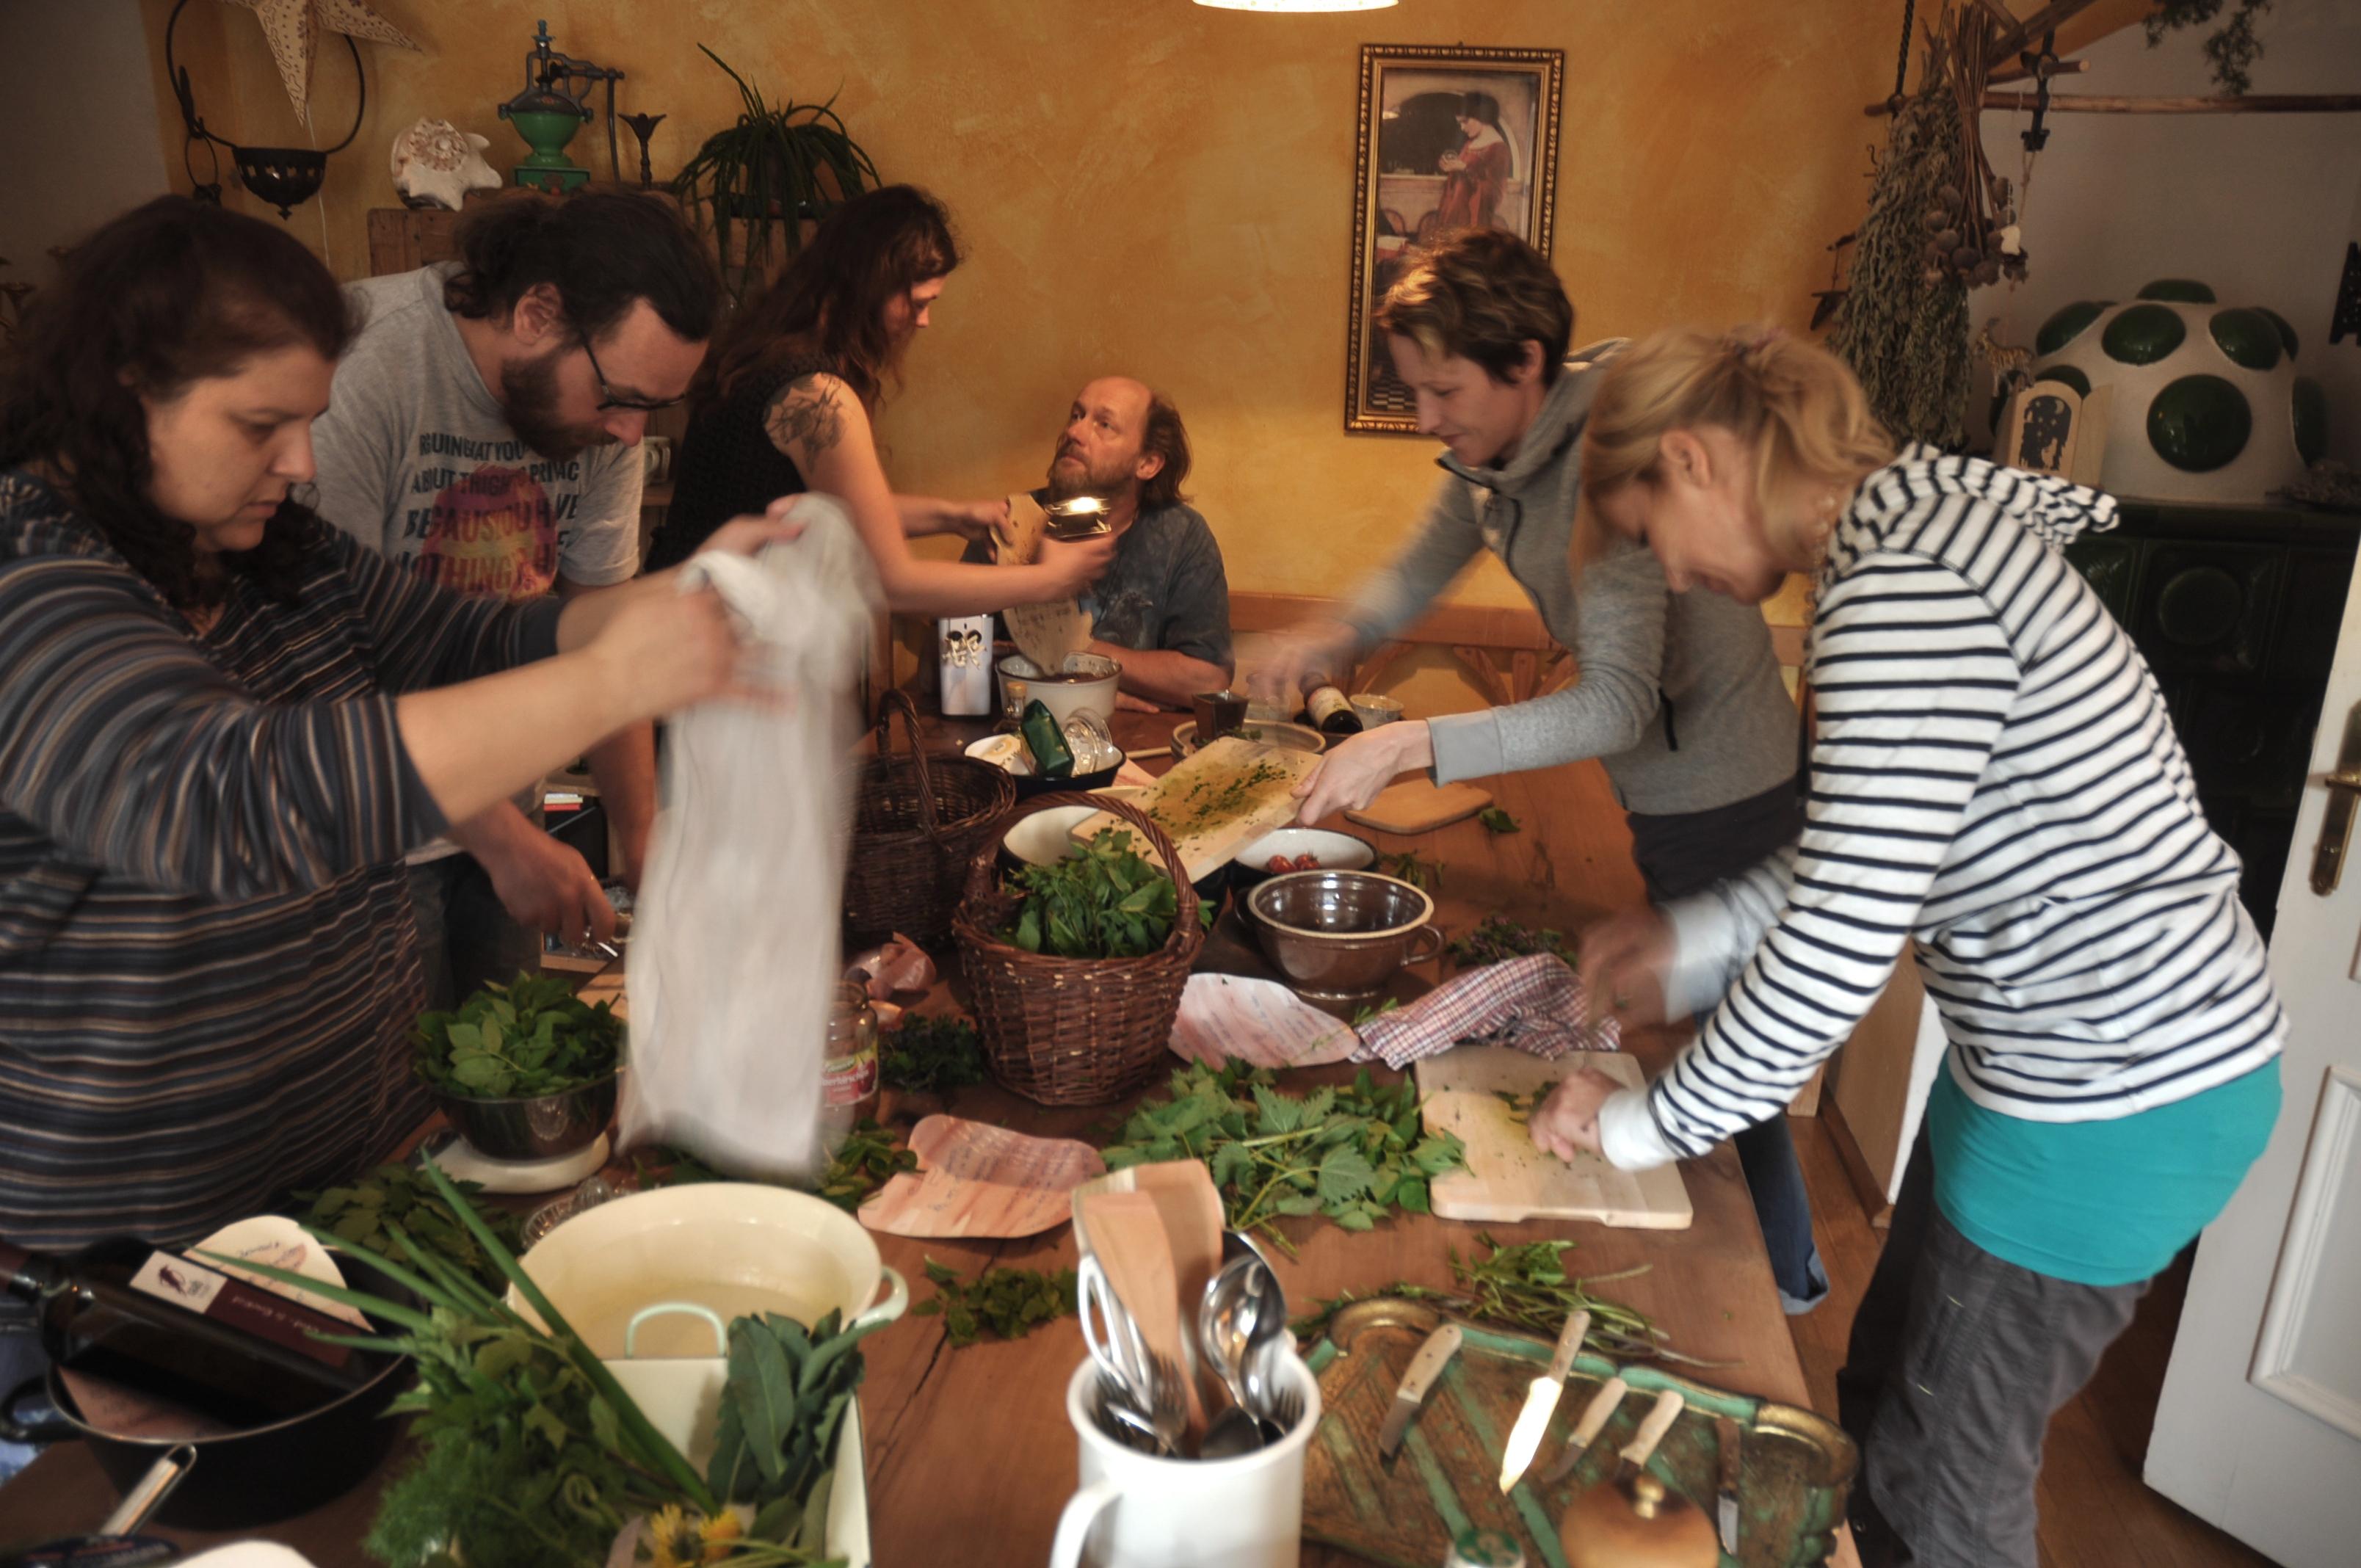 Bei der Vorbereitung des Kräutermenüs (Foto: Michael Hohla)